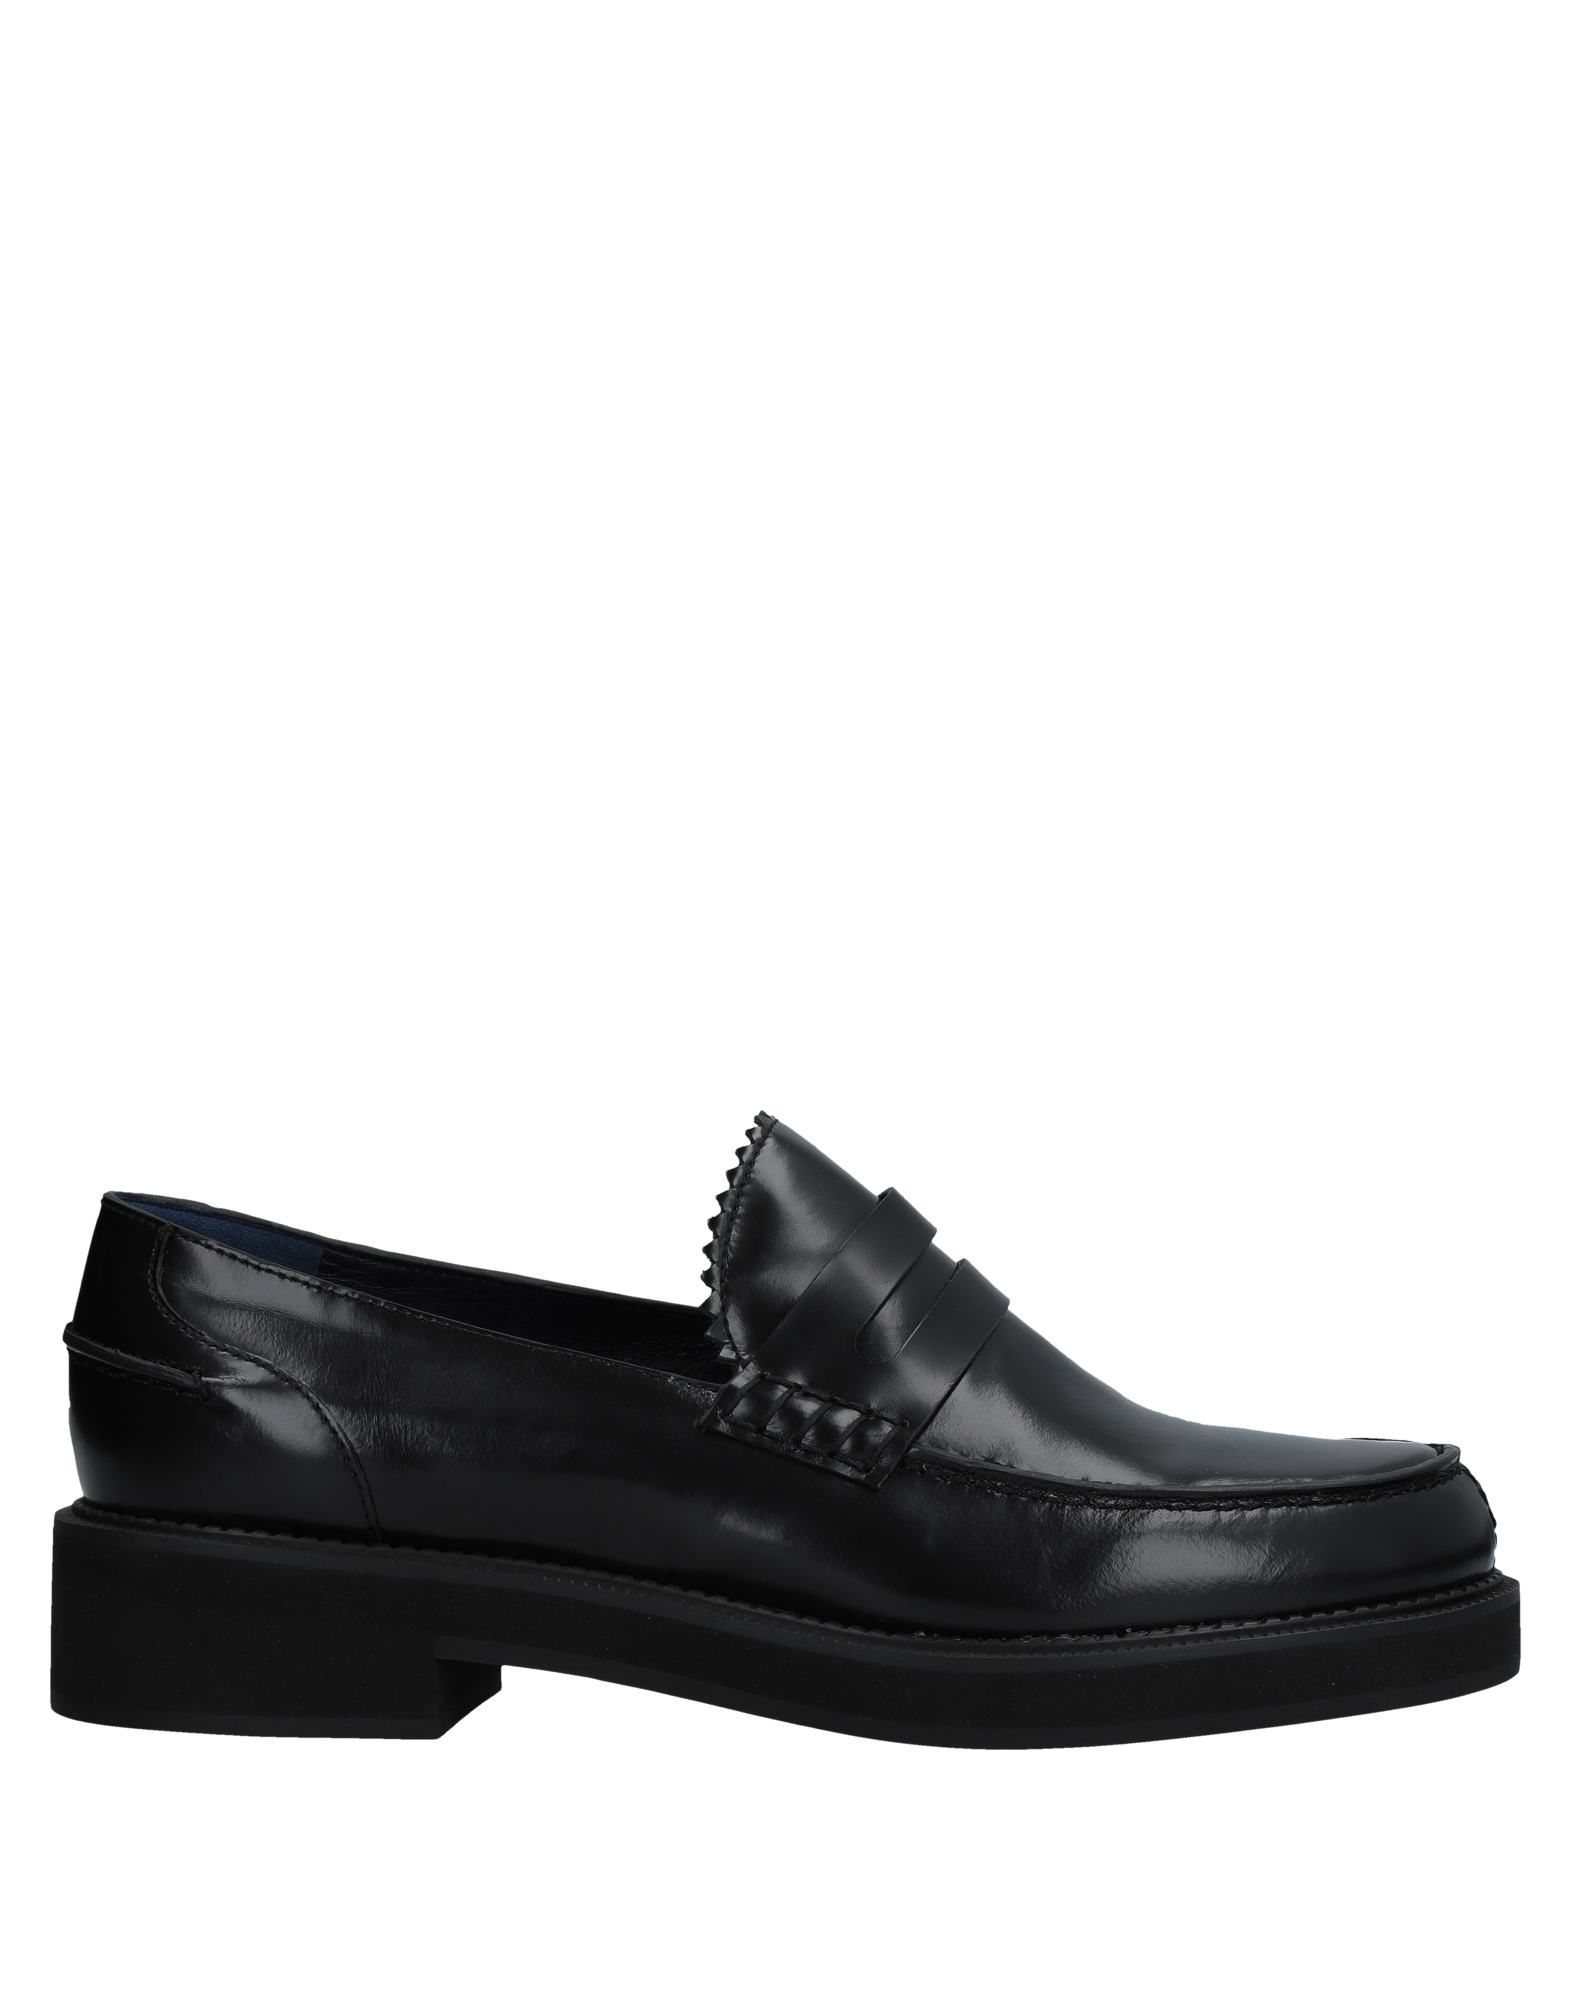 Jil Sander Navy Mokassins Damen  11542107TVGut aussehende strapazierfähige Schuhe